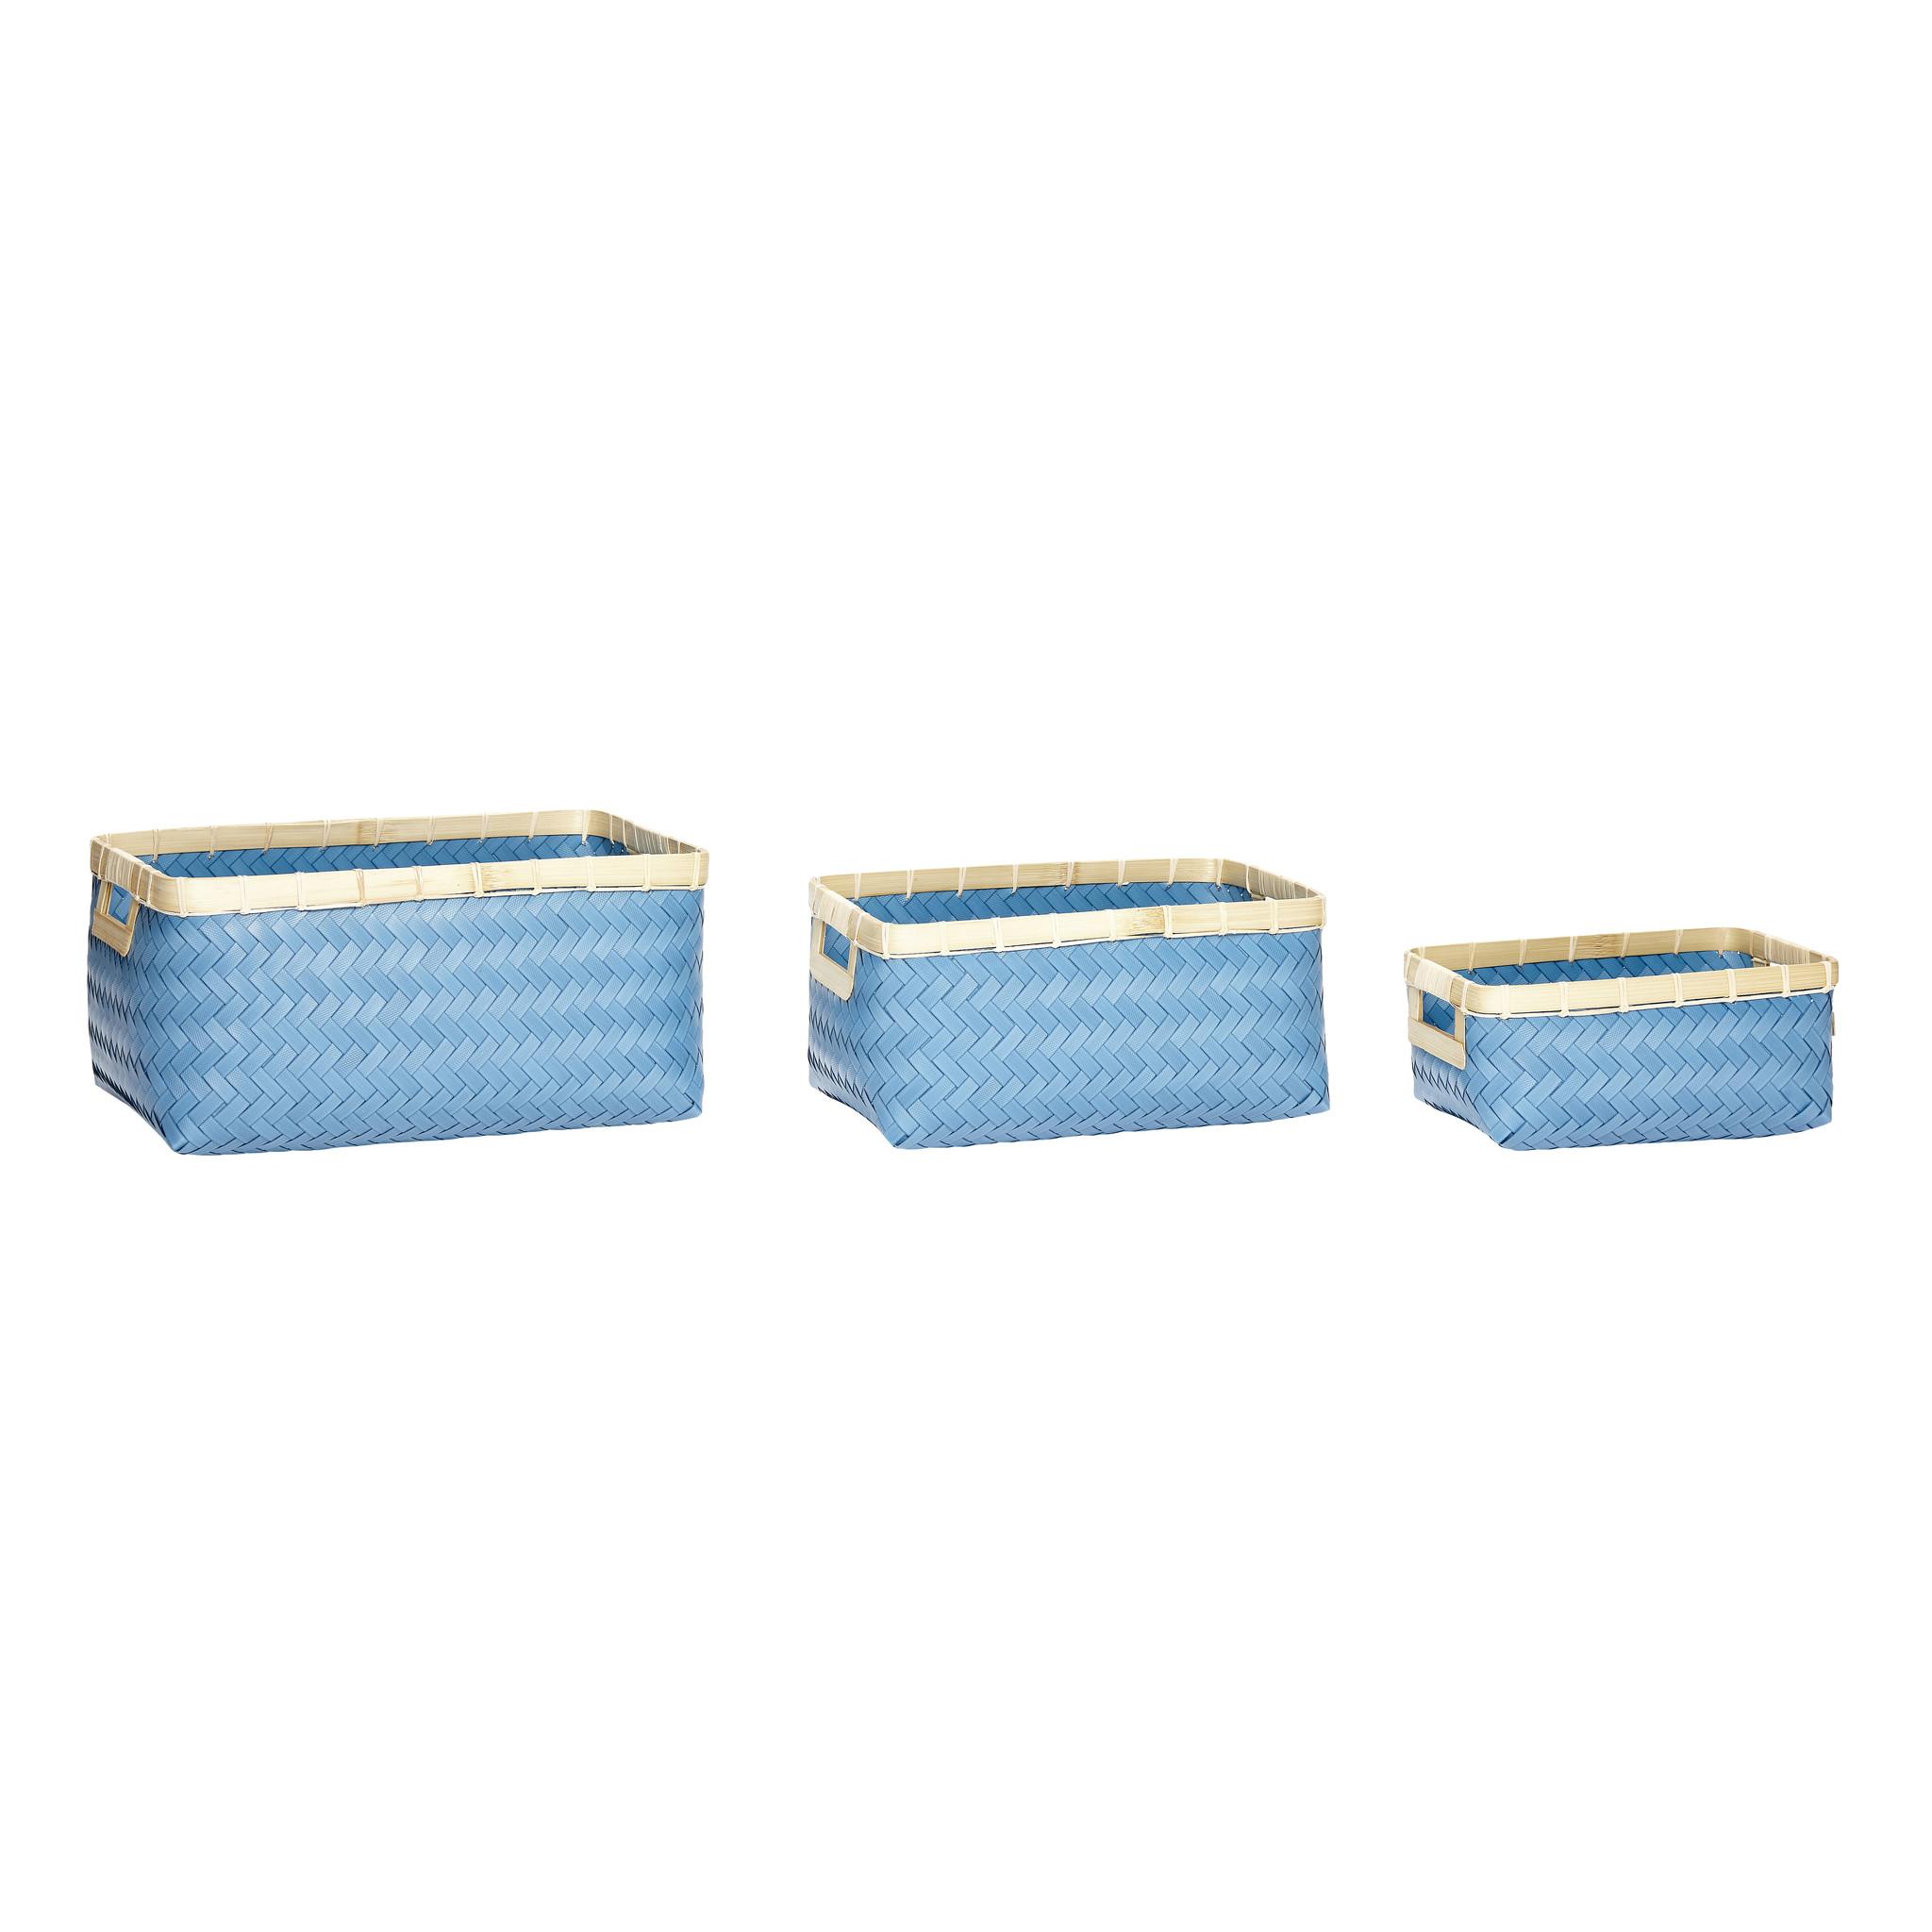 Hubsch Mand, polyrattan / bamboe, blauw / natuur, set van 3